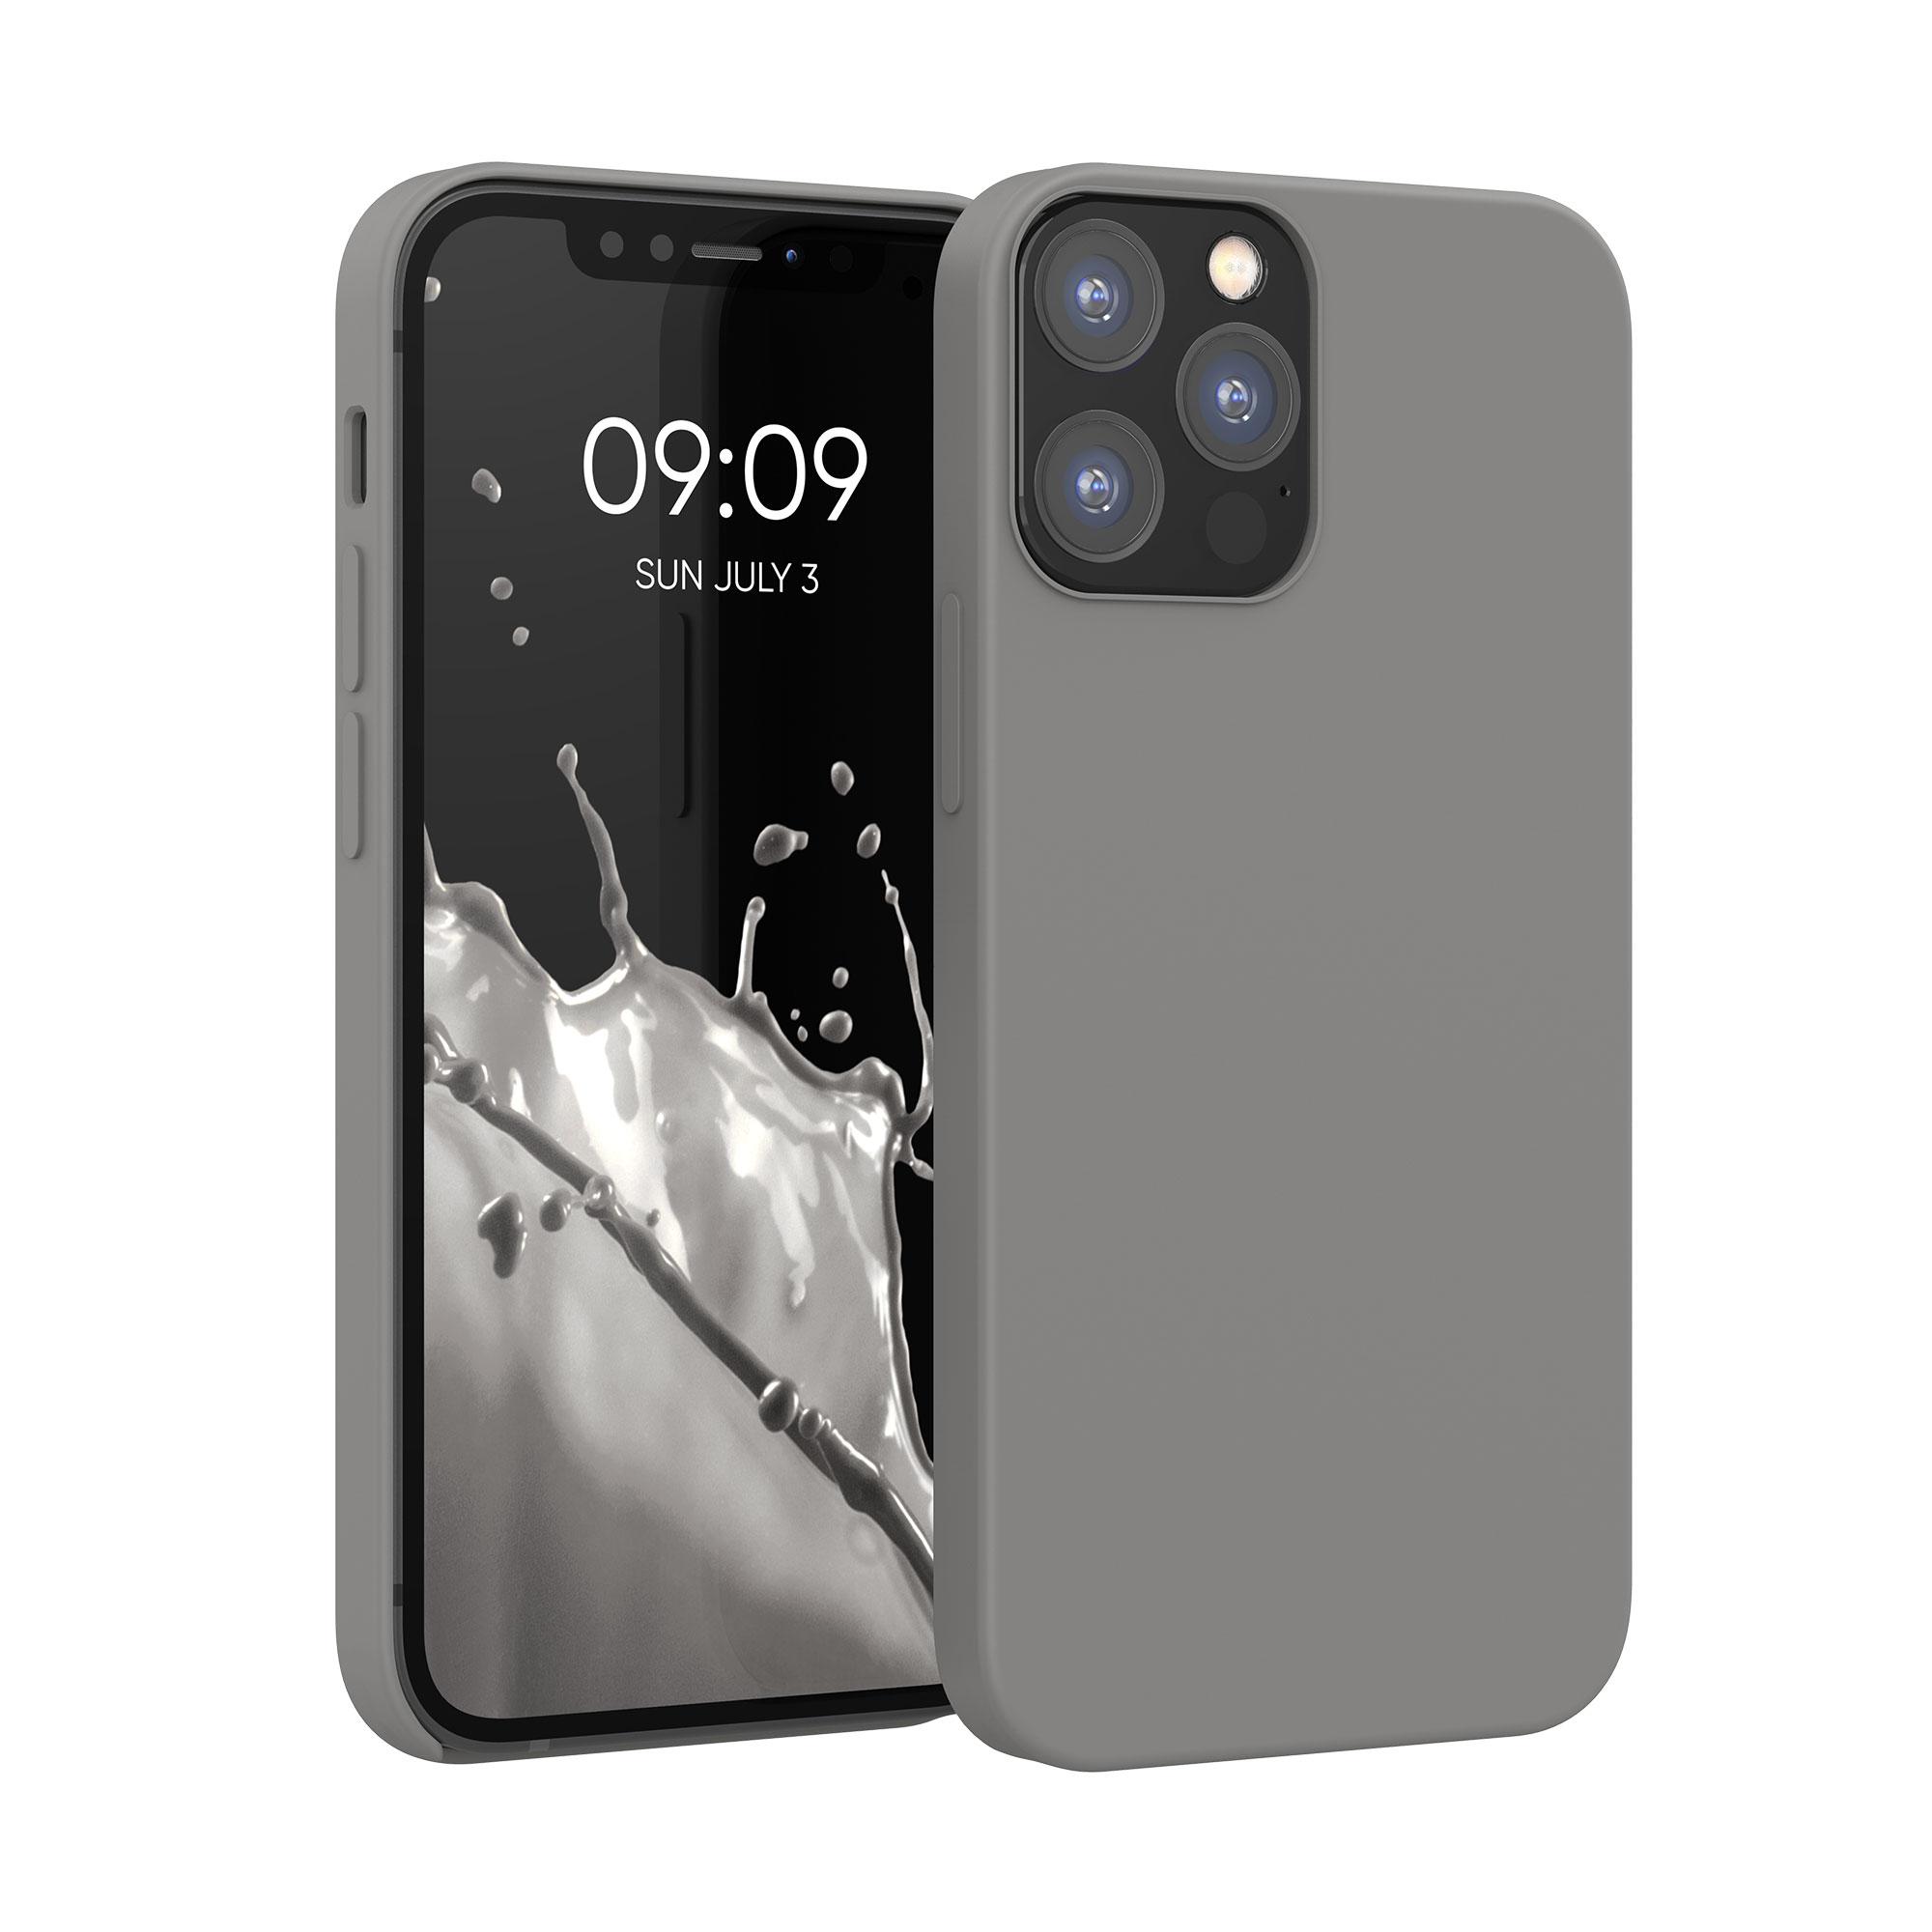 Kvalitní silikonové TPU pouzdro pro Apple iPhone 12 / 12 Pro - Titanium Gray